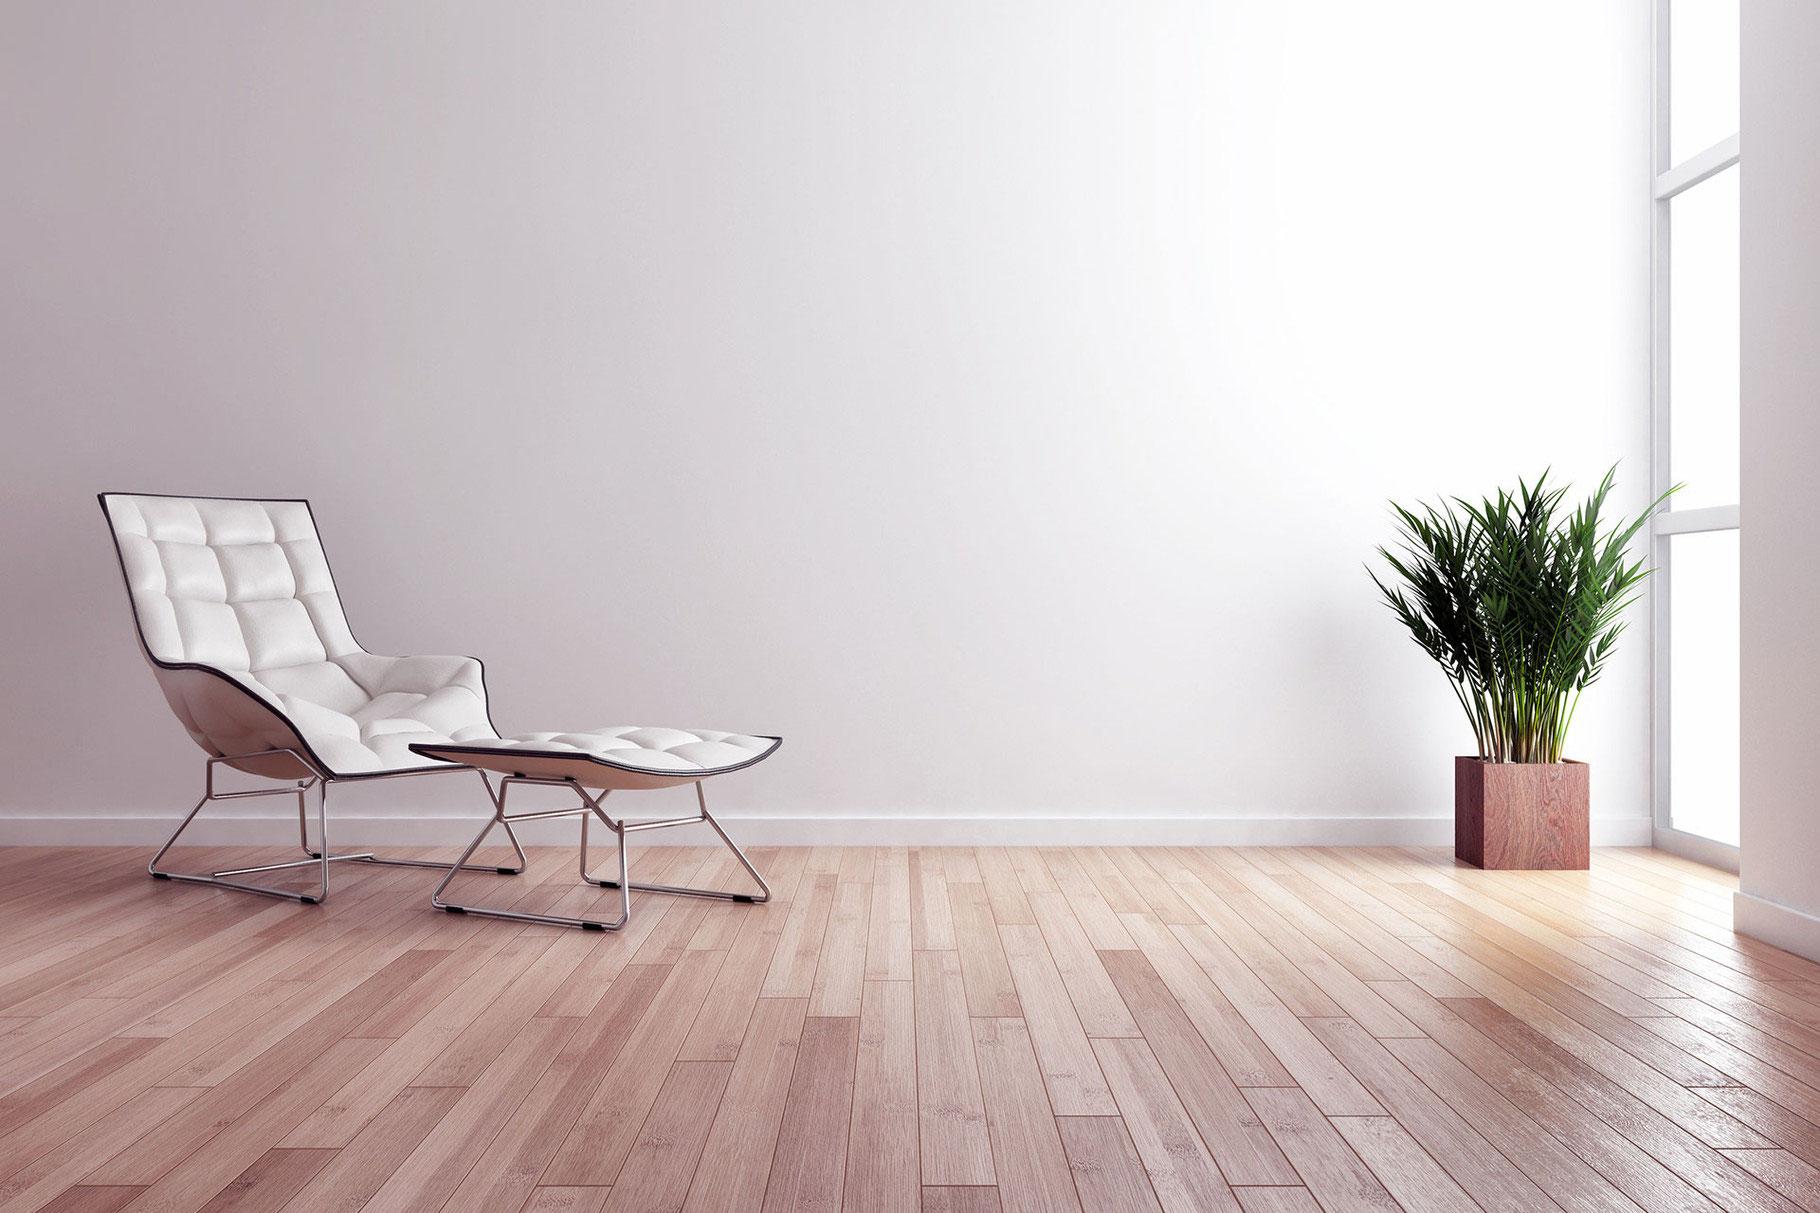 laminat auf holzboden best welches laminat fr die kche. Black Bedroom Furniture Sets. Home Design Ideas